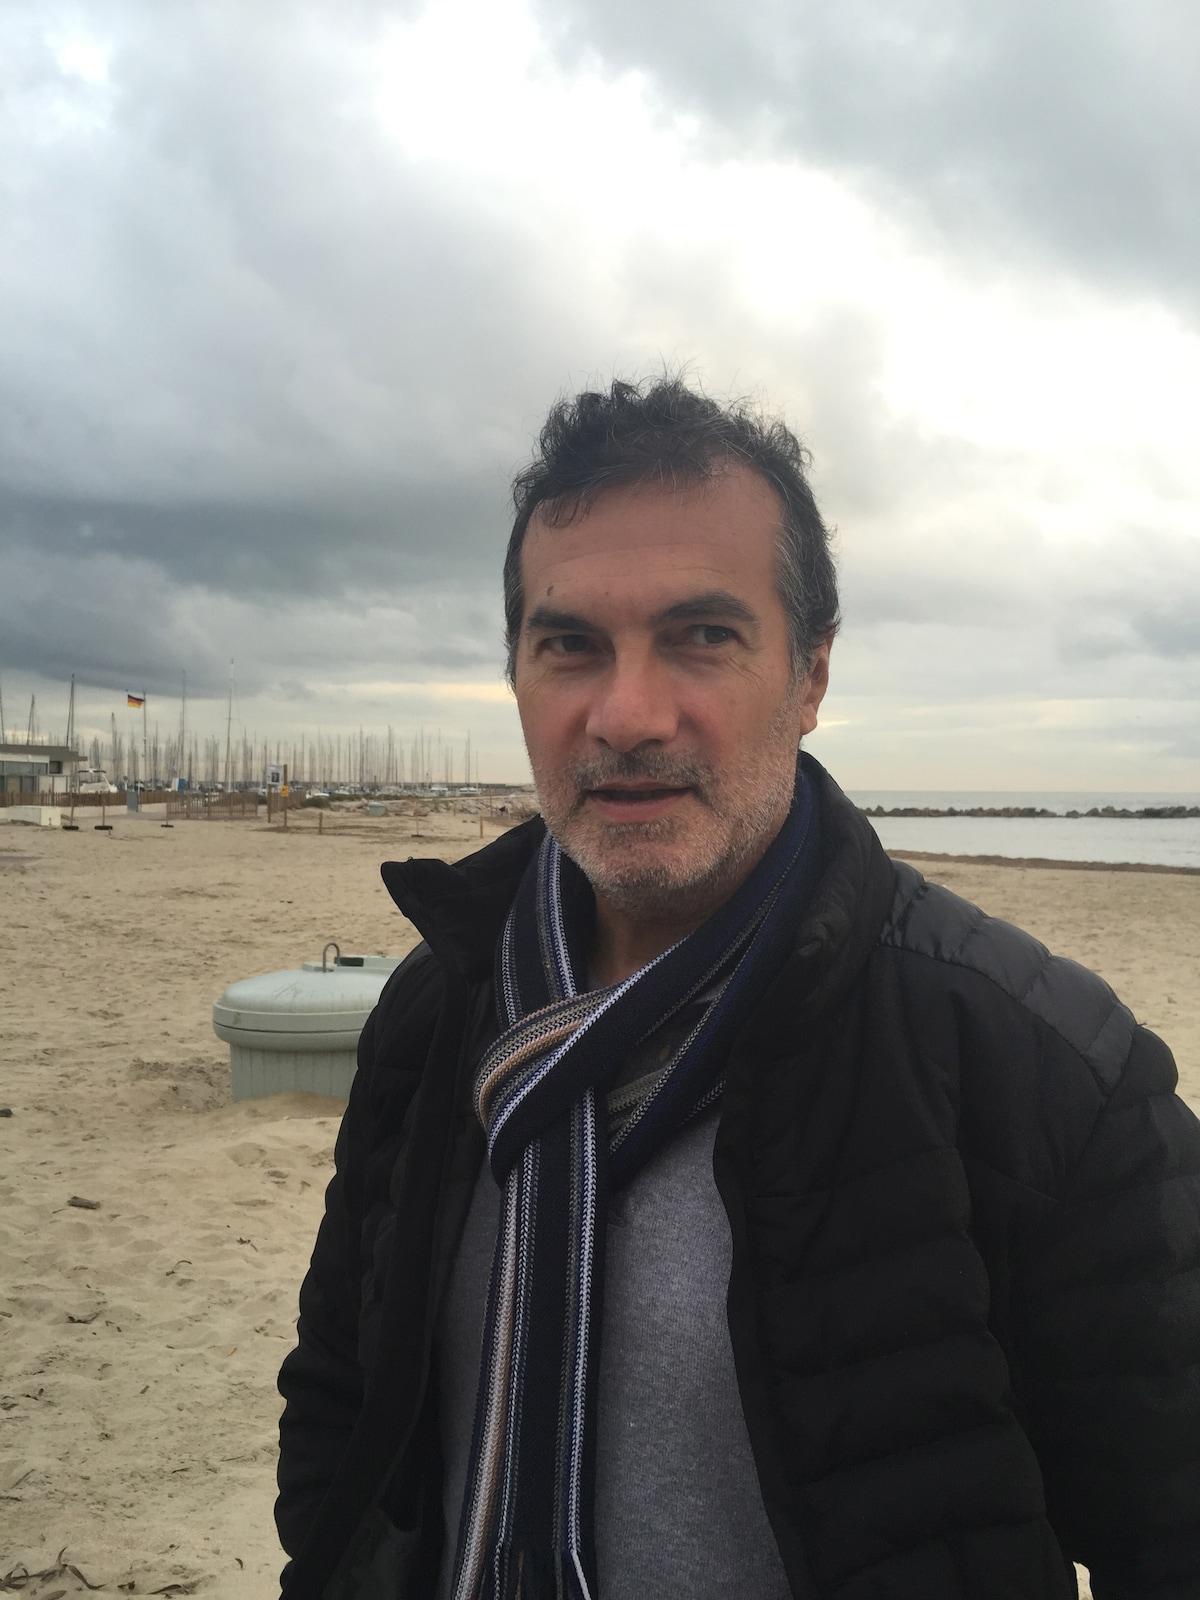 Bernard from Montpellier